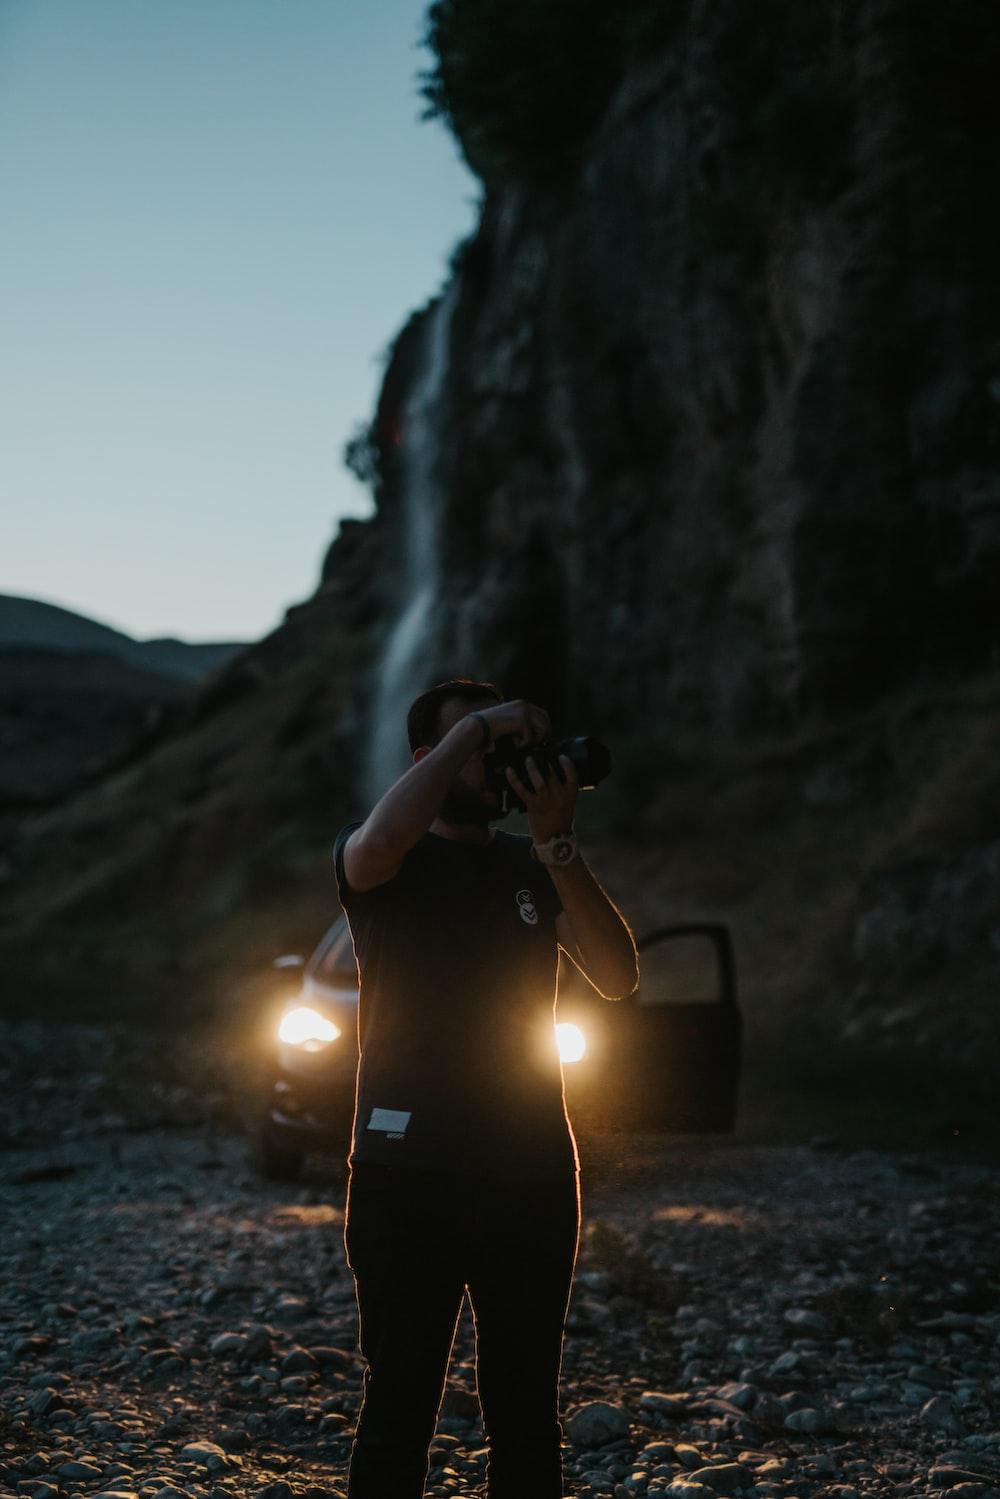 person in black jacket sitting on rock near waterfalls during daytime